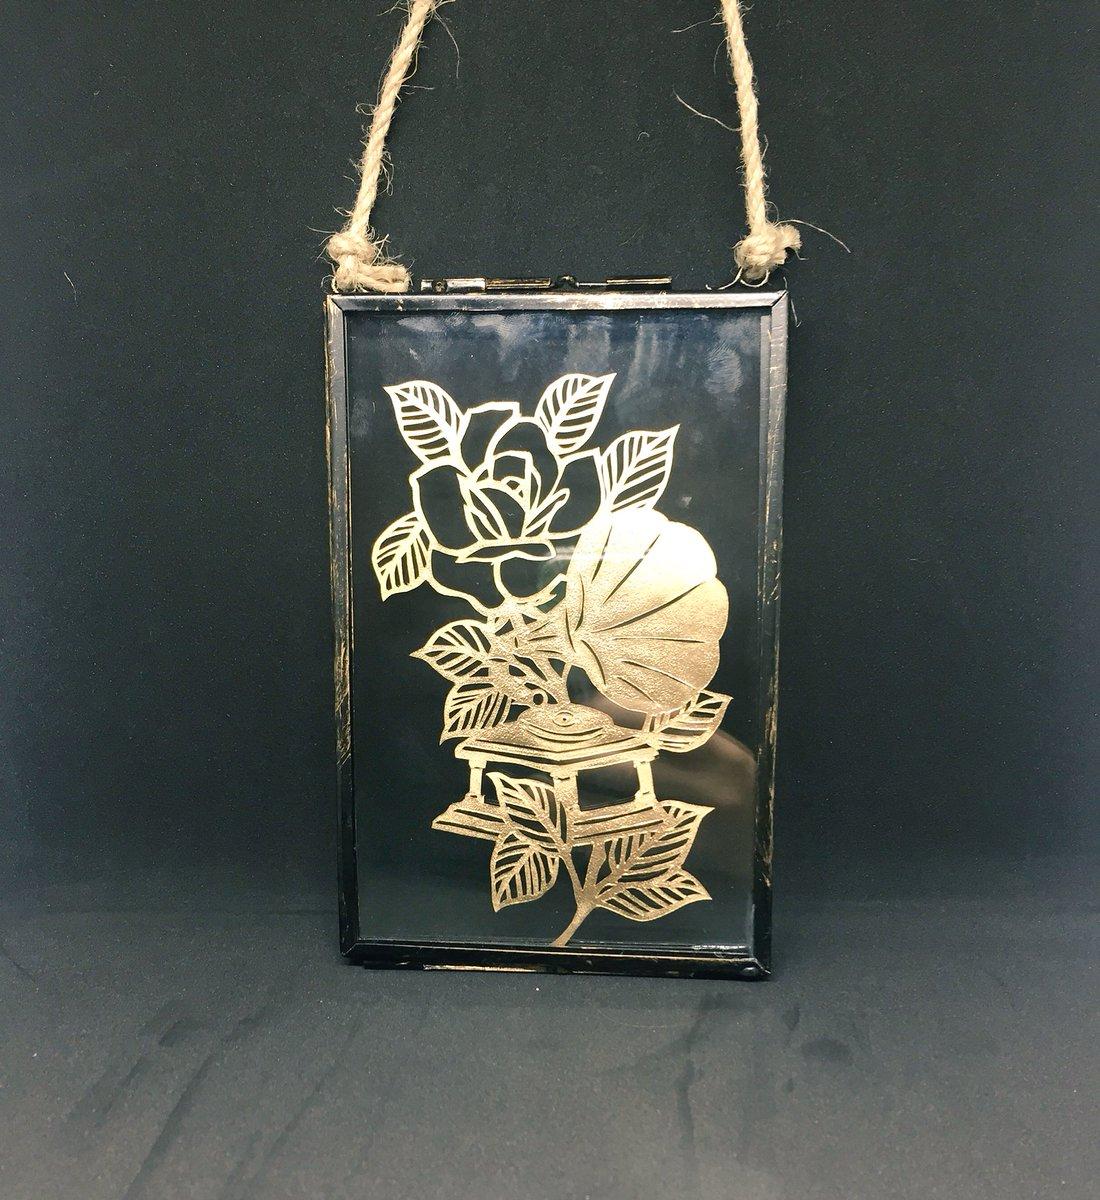 Loving my designs in gold    https://www. etsy.com/uk/listing/533 454588/traditional-tattoo-design-gramophone &nbsp; …   #handmadehour #craftbuzz #itschristmas #etsygifts #handmade #traditionaltattoo #home<br>http://pic.twitter.com/gd9aVf4ZlD